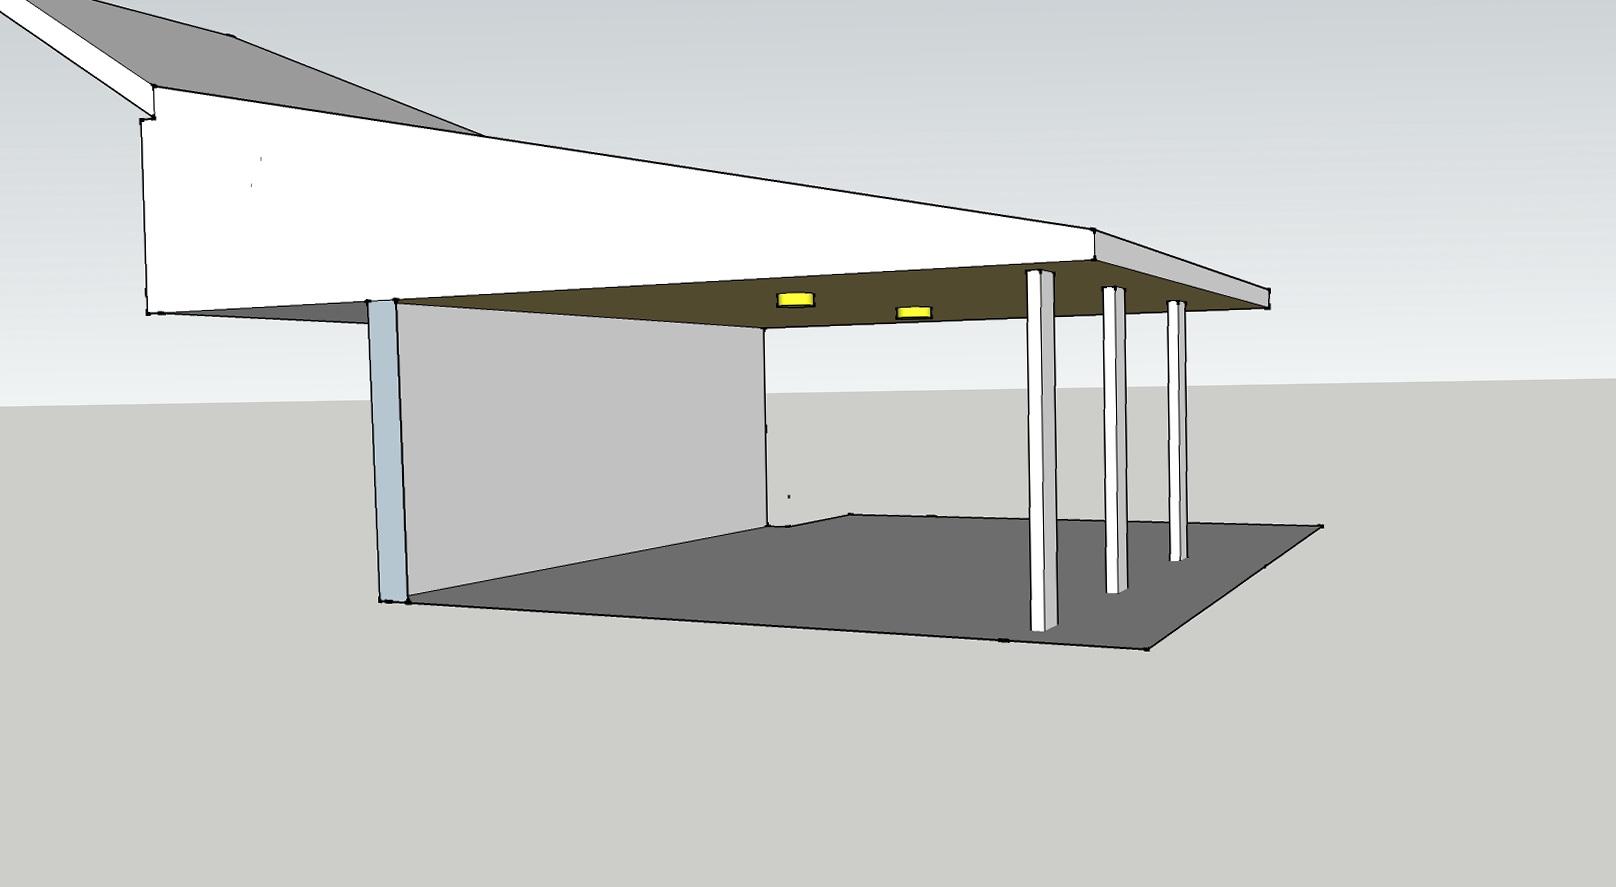 Flat Roof Porch Designs